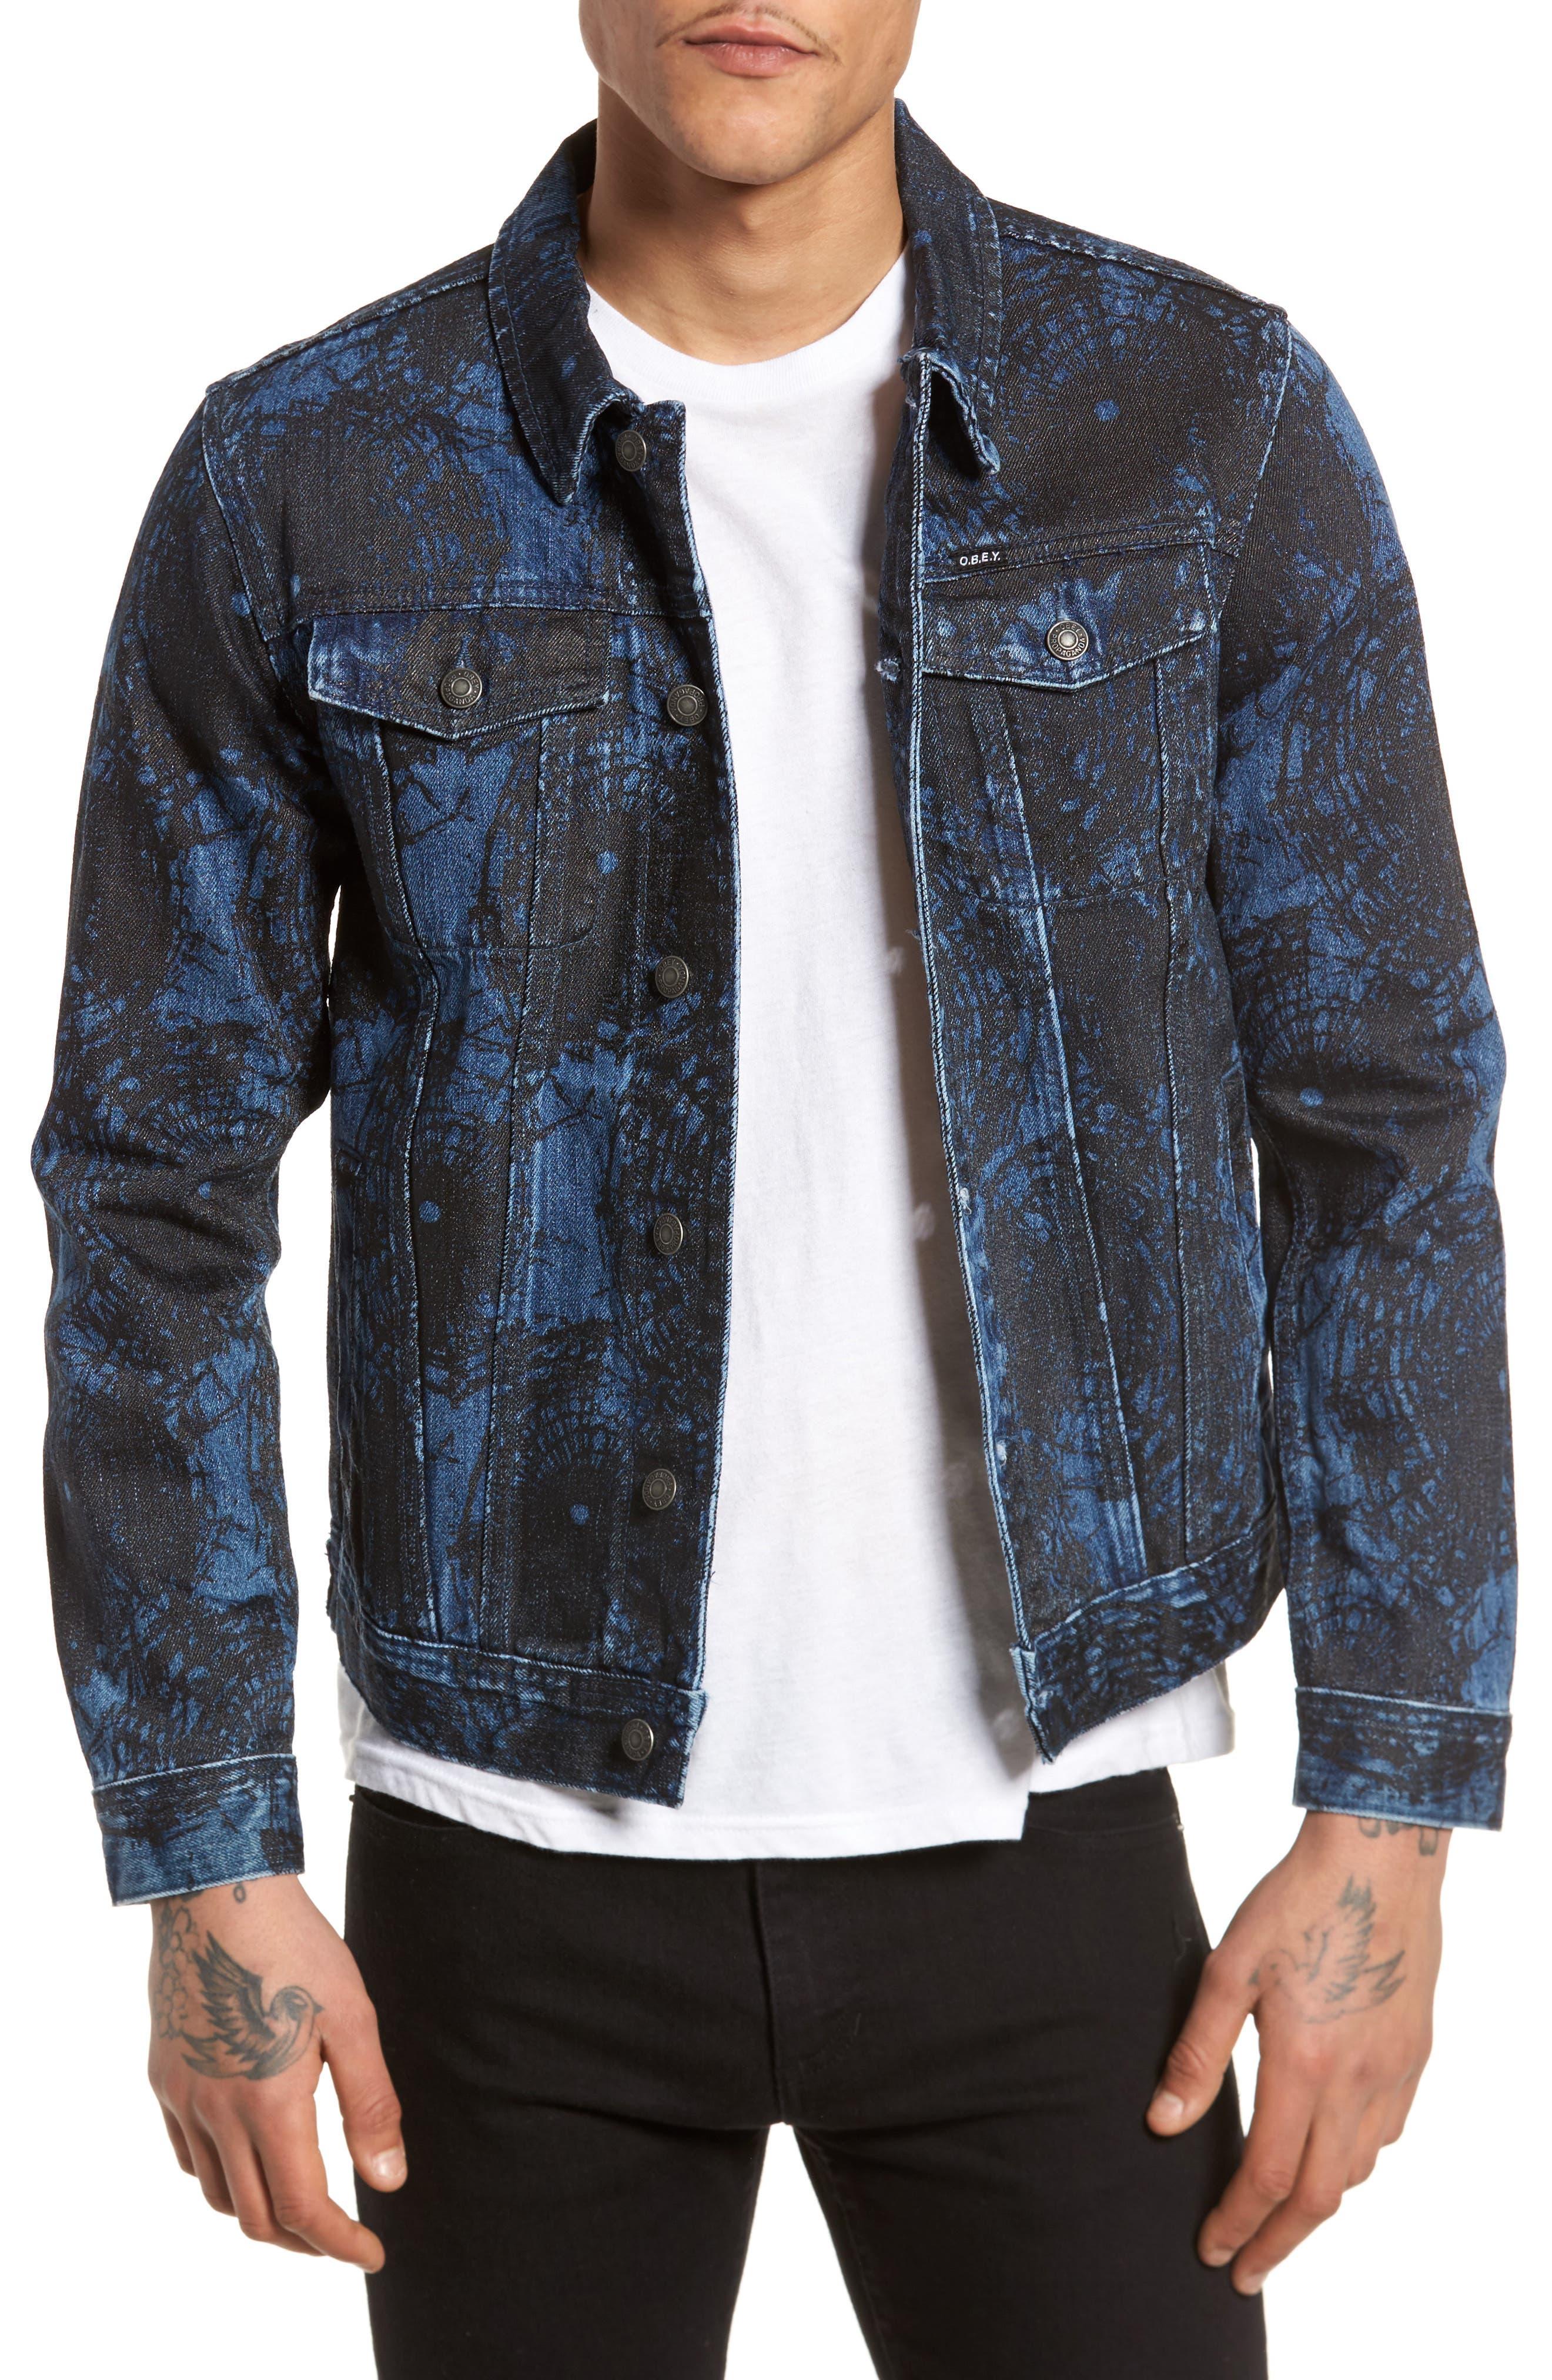 Shattered Denim Jacket,                             Main thumbnail 1, color,                             002